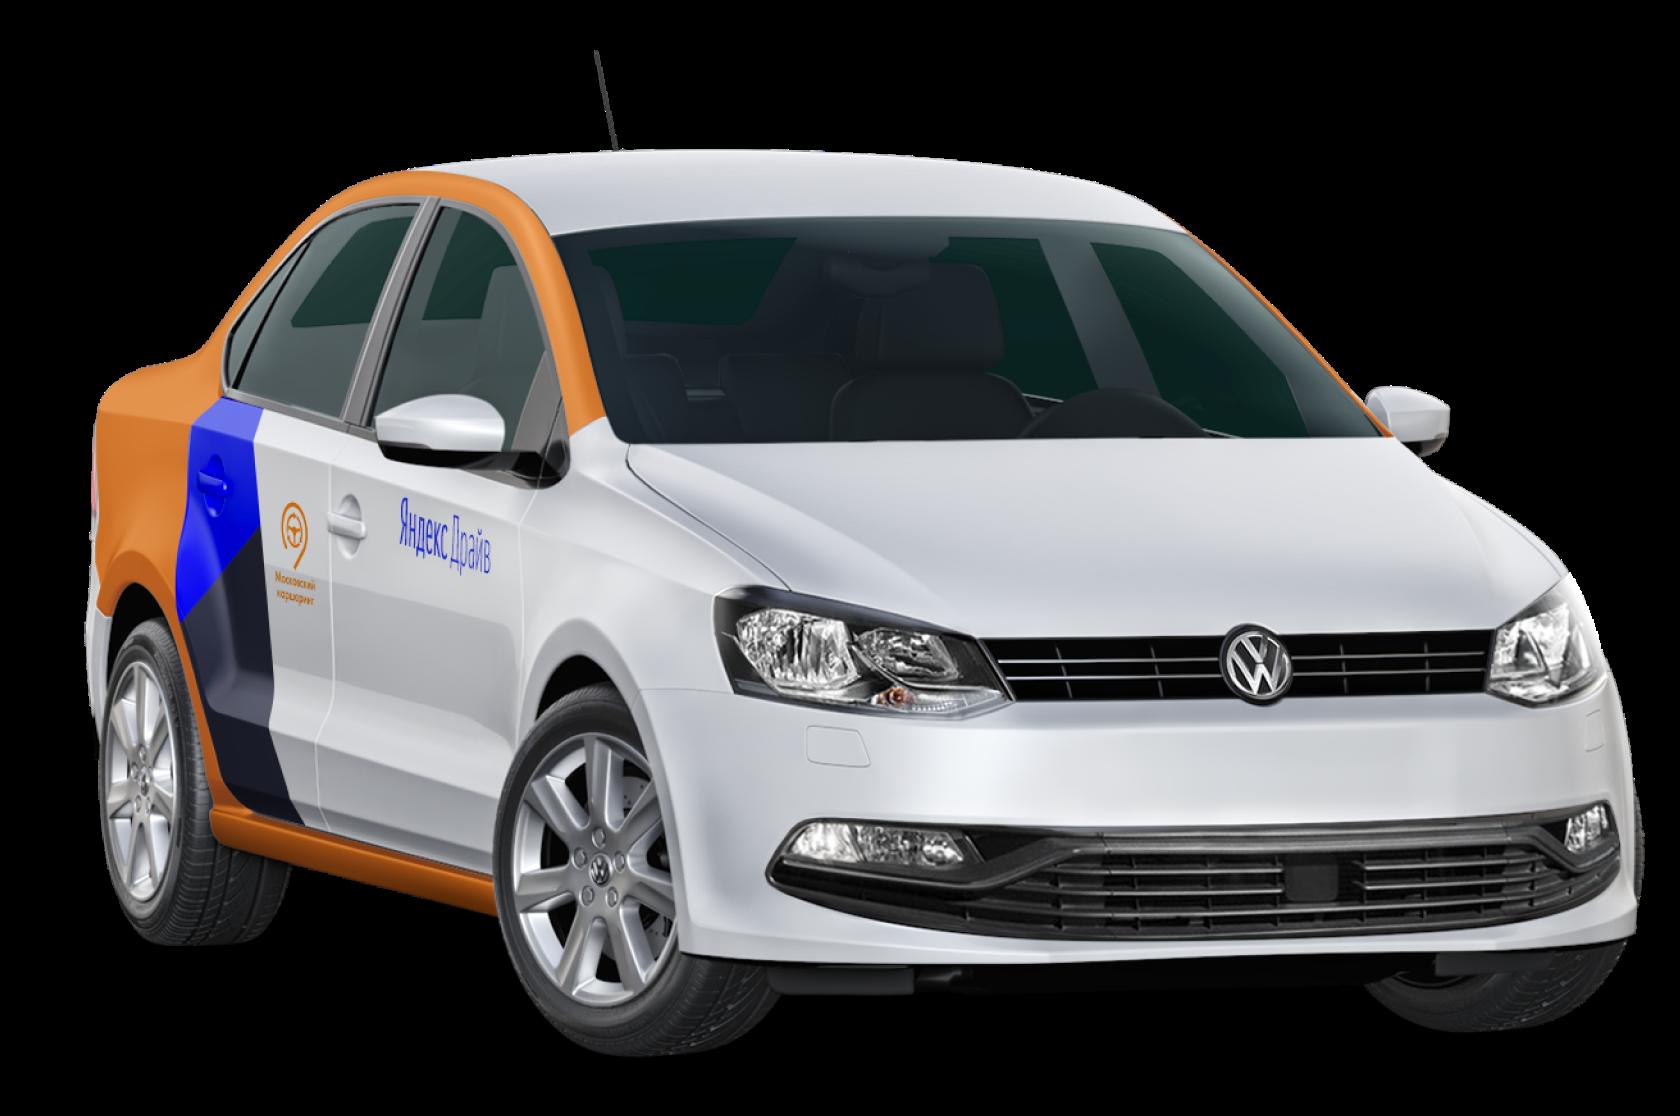 Volkswagen<br>Polo